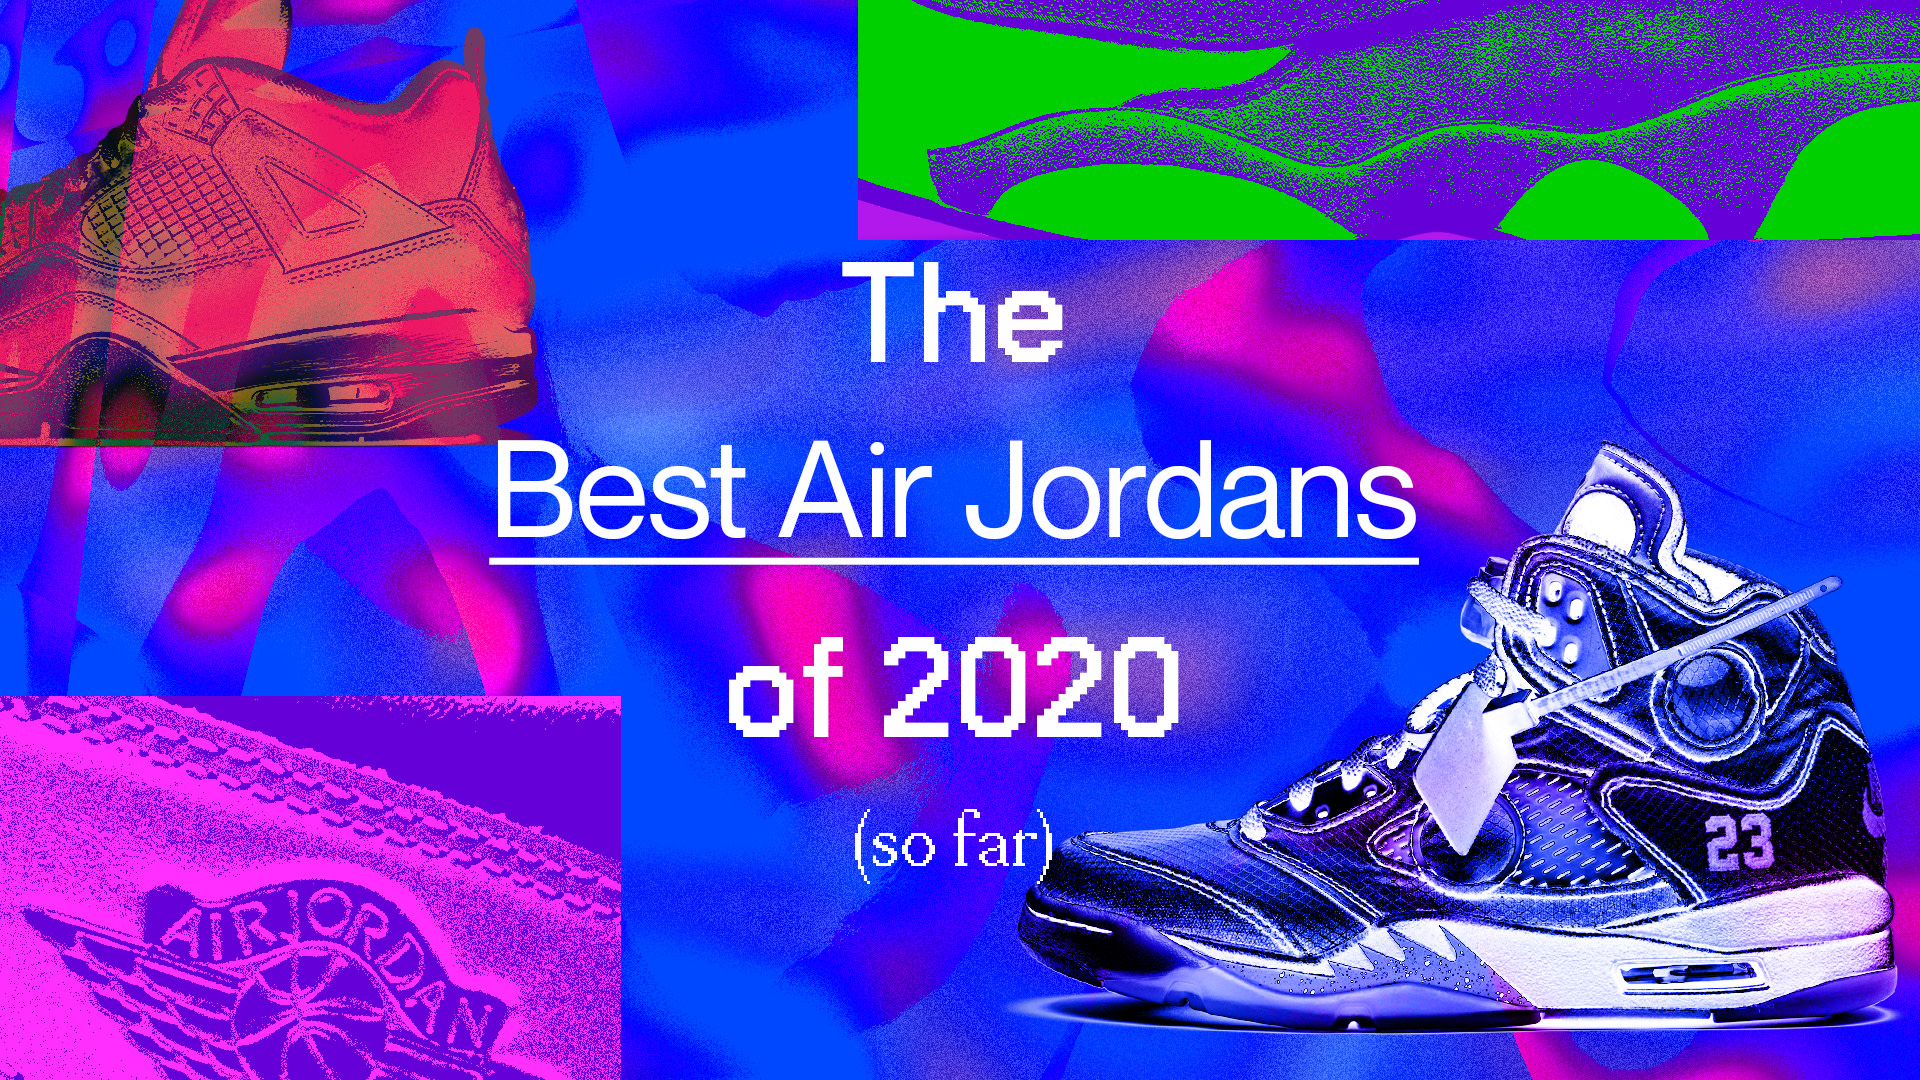 Best Air Jordans of 2020